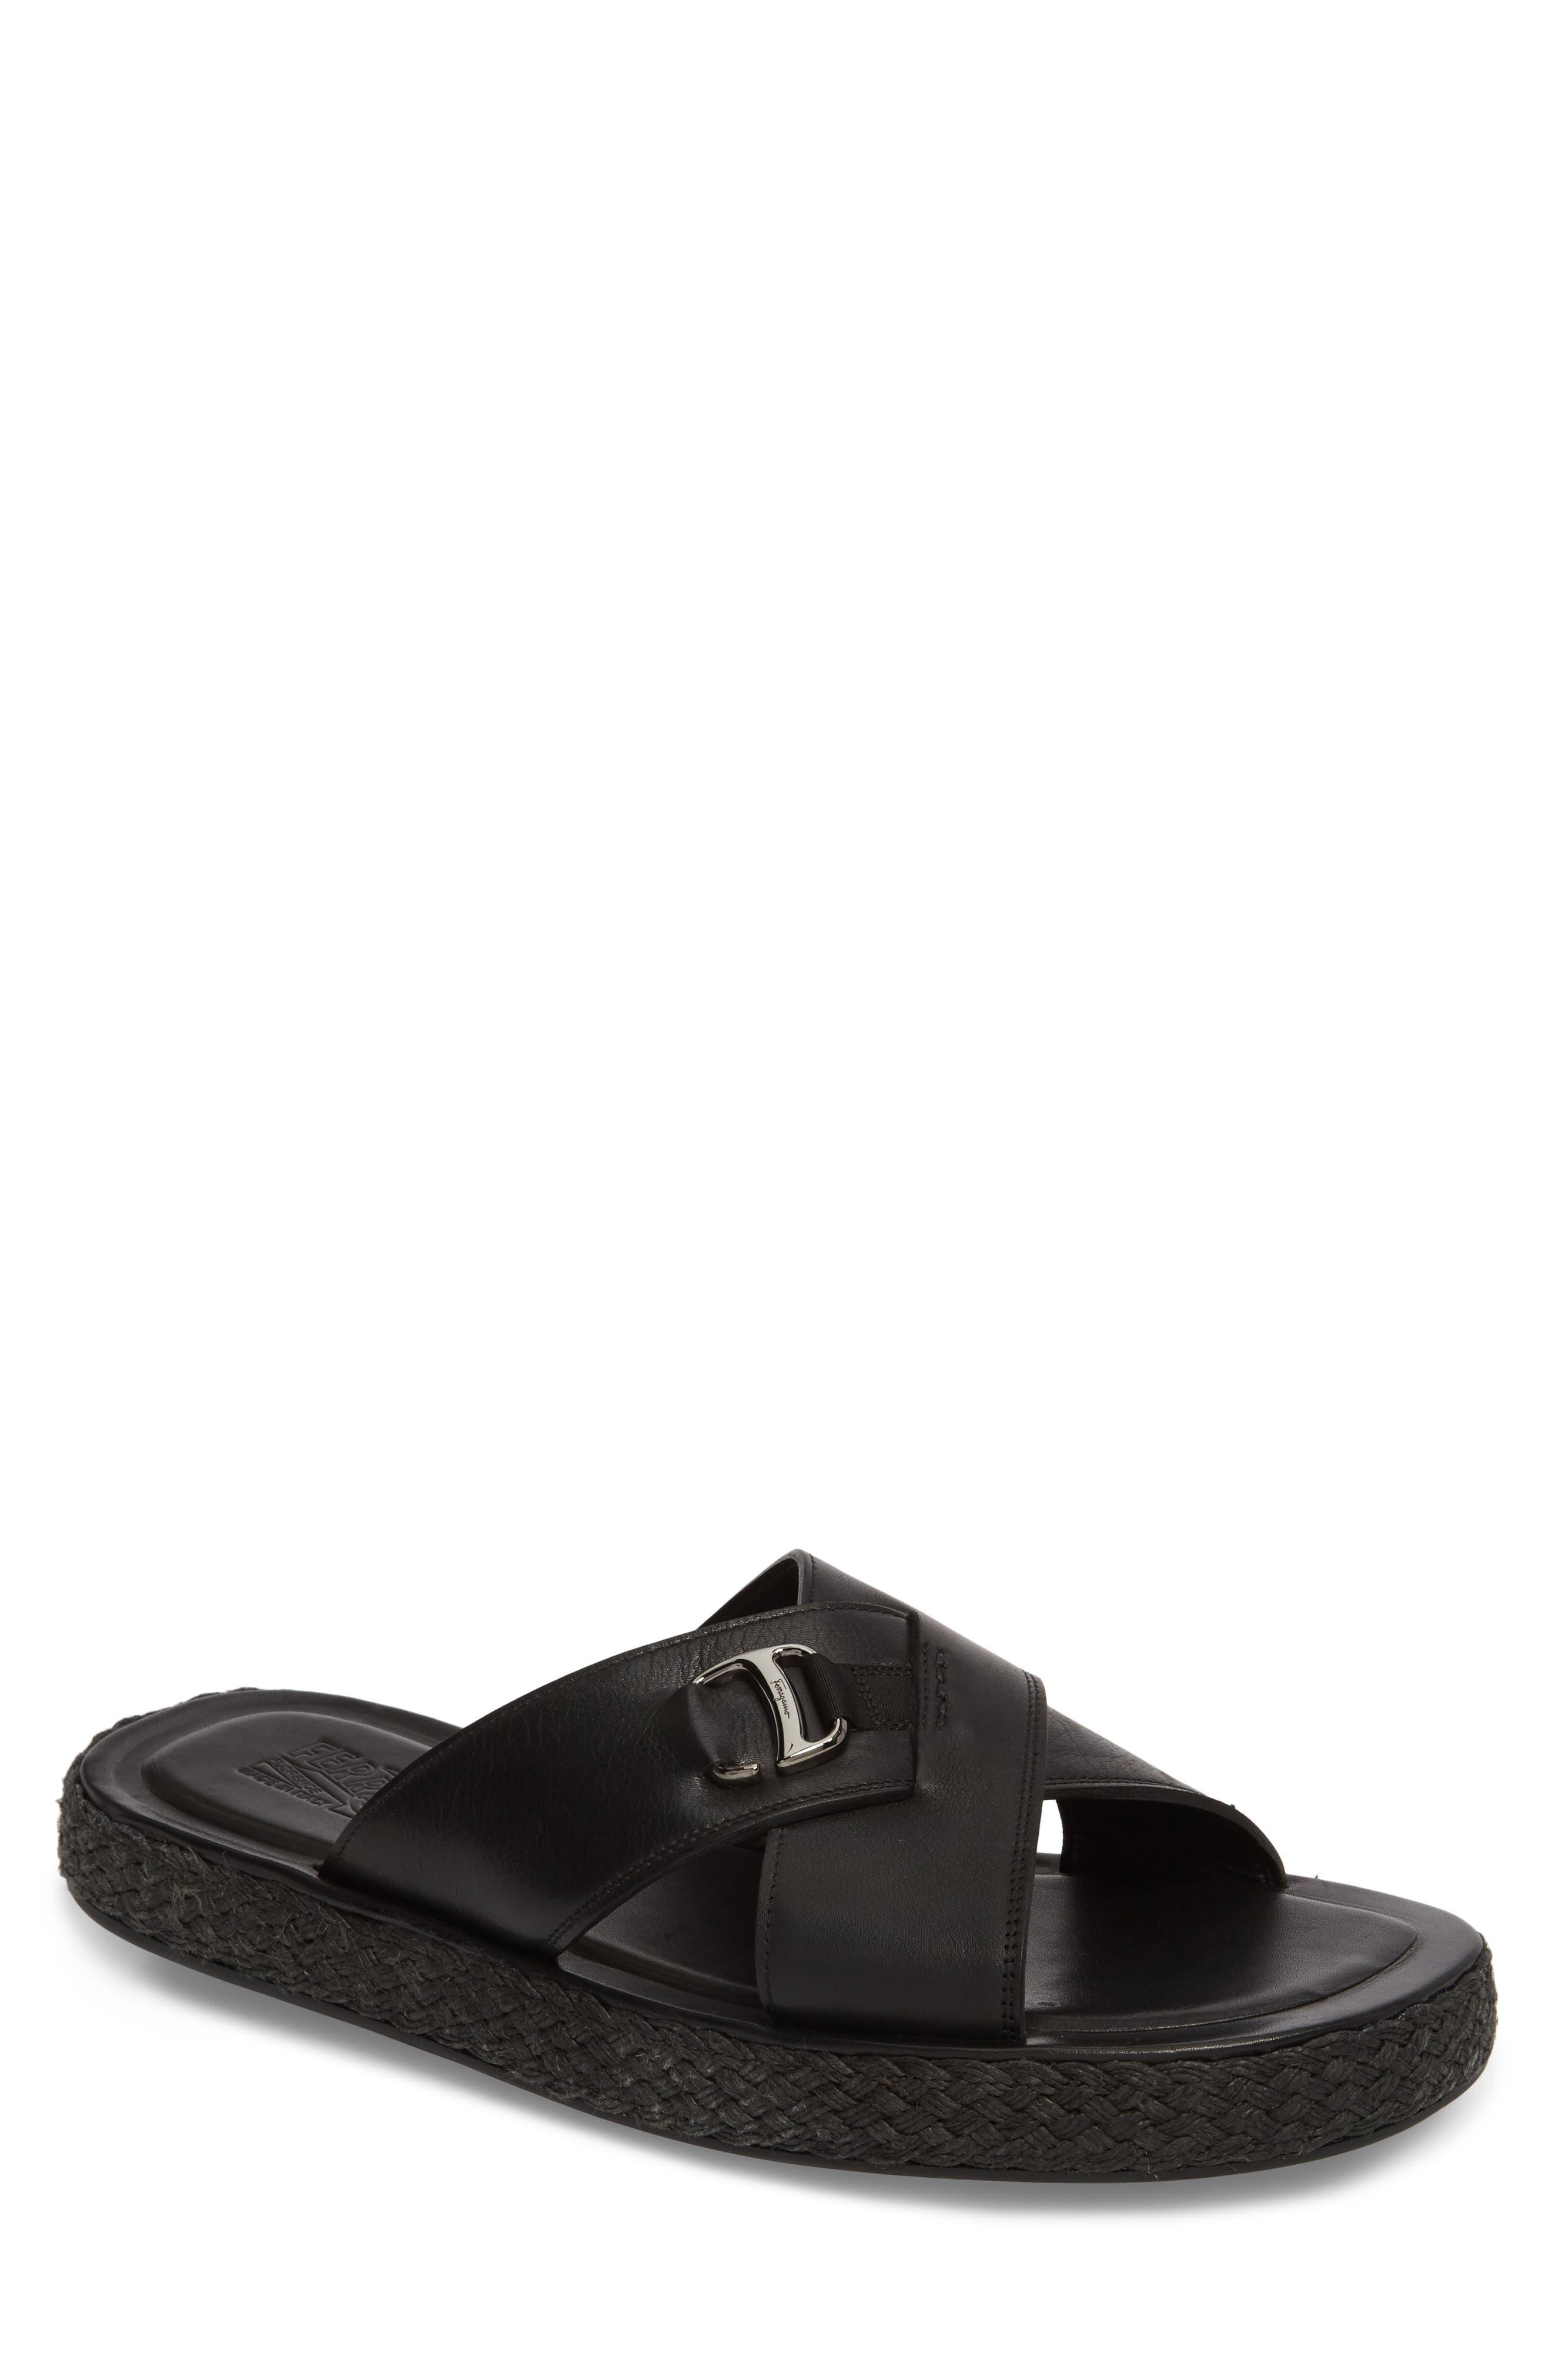 Comodo Slide Sandal,                         Main,                         color, 001